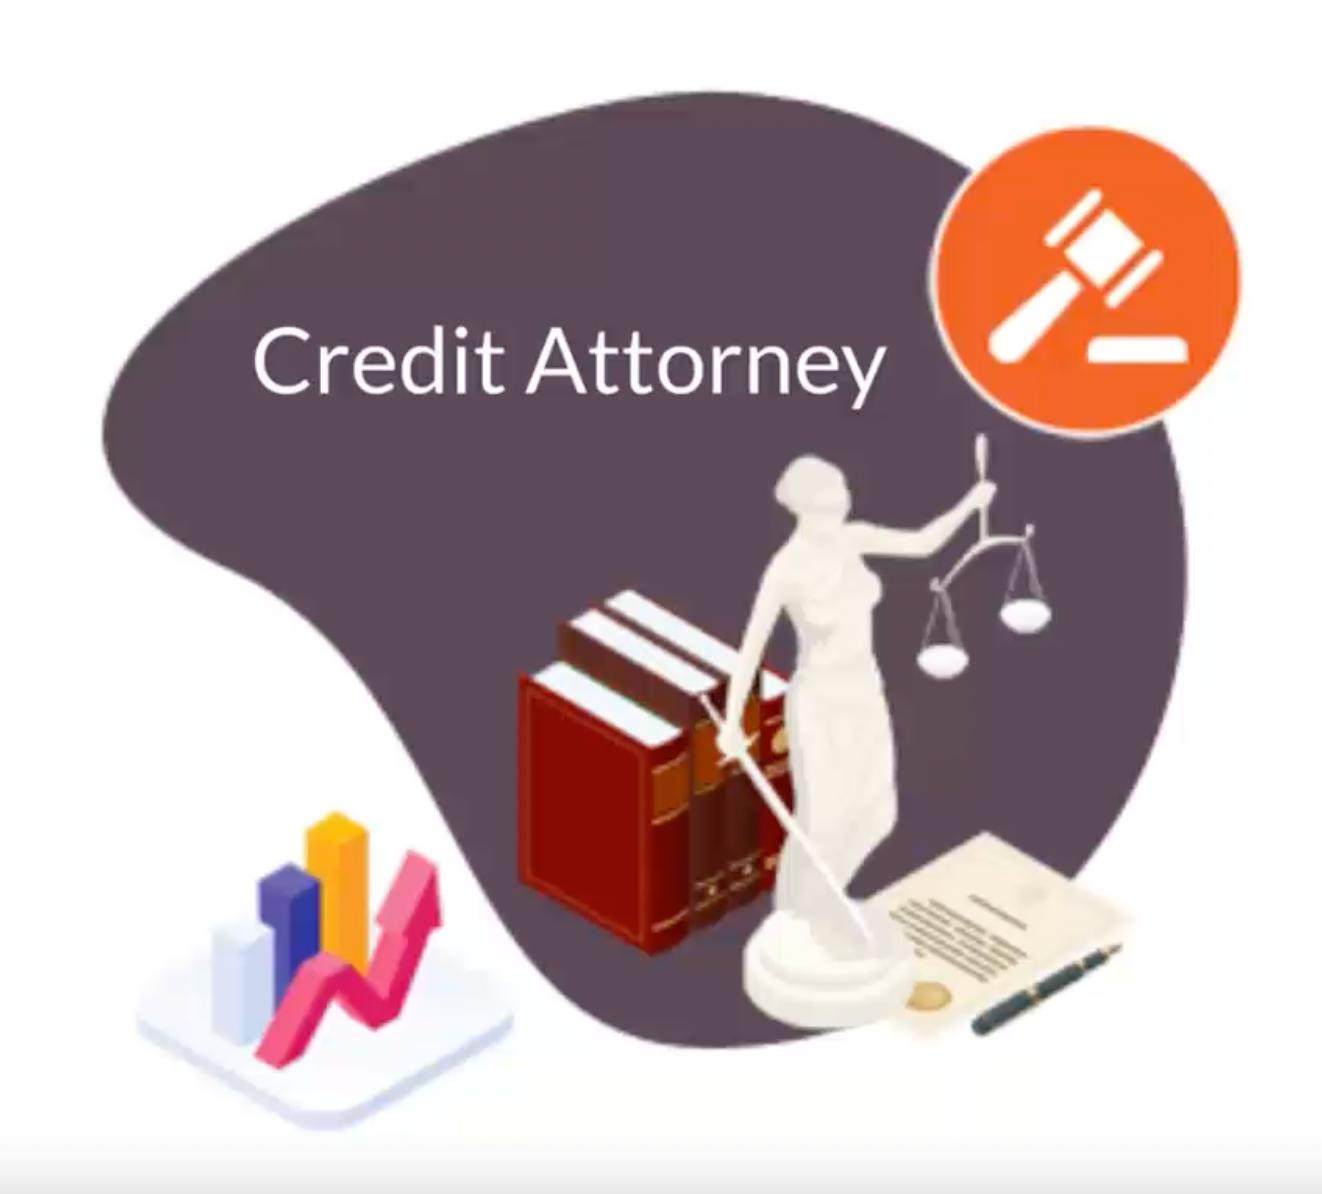 Credit Attorney